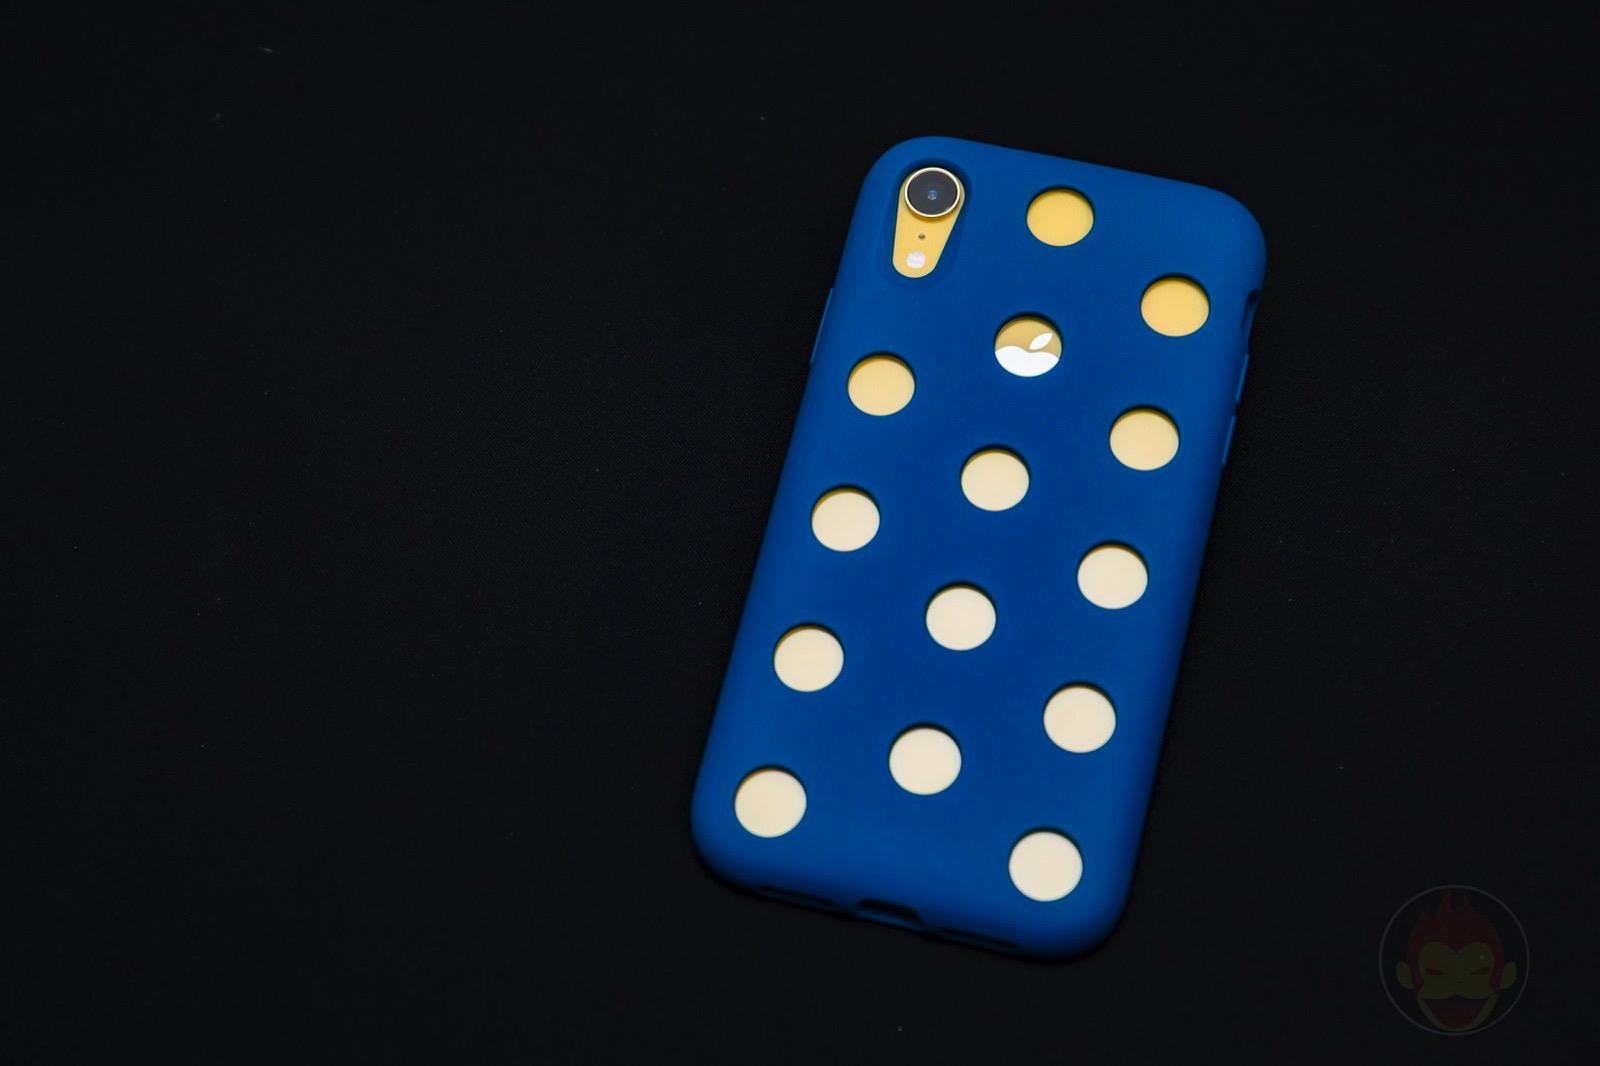 AndMesh-Layer-Case-Cobalt-Blue-for-iPhoneXR-01.jpg